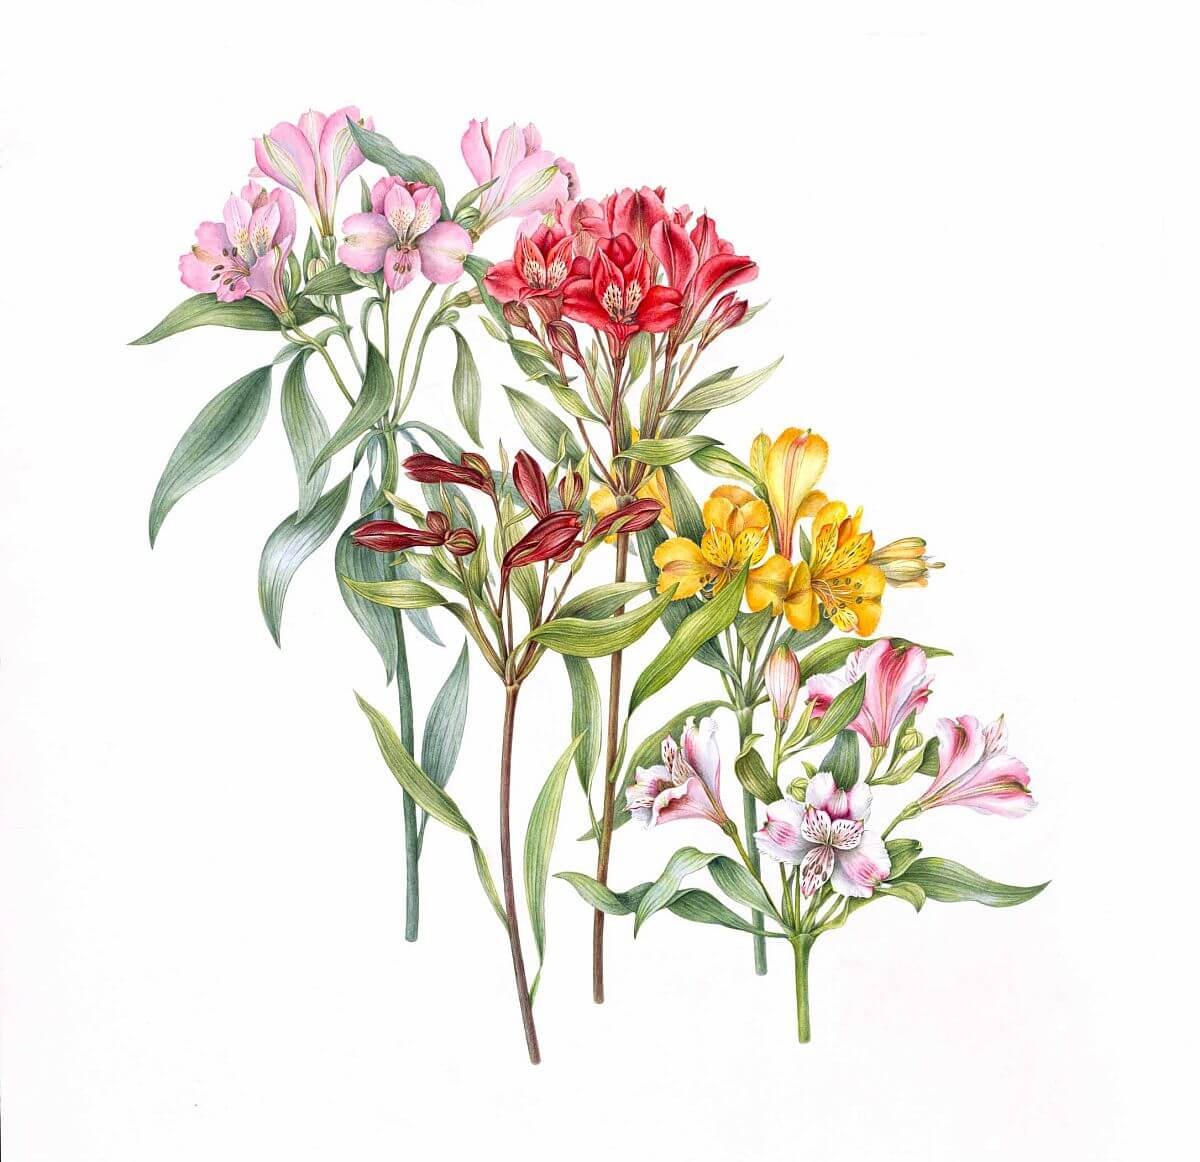 adelaparvu.com despre arta botanica in Romania, Alstroemeria, artist Anita Walsmit Sachs